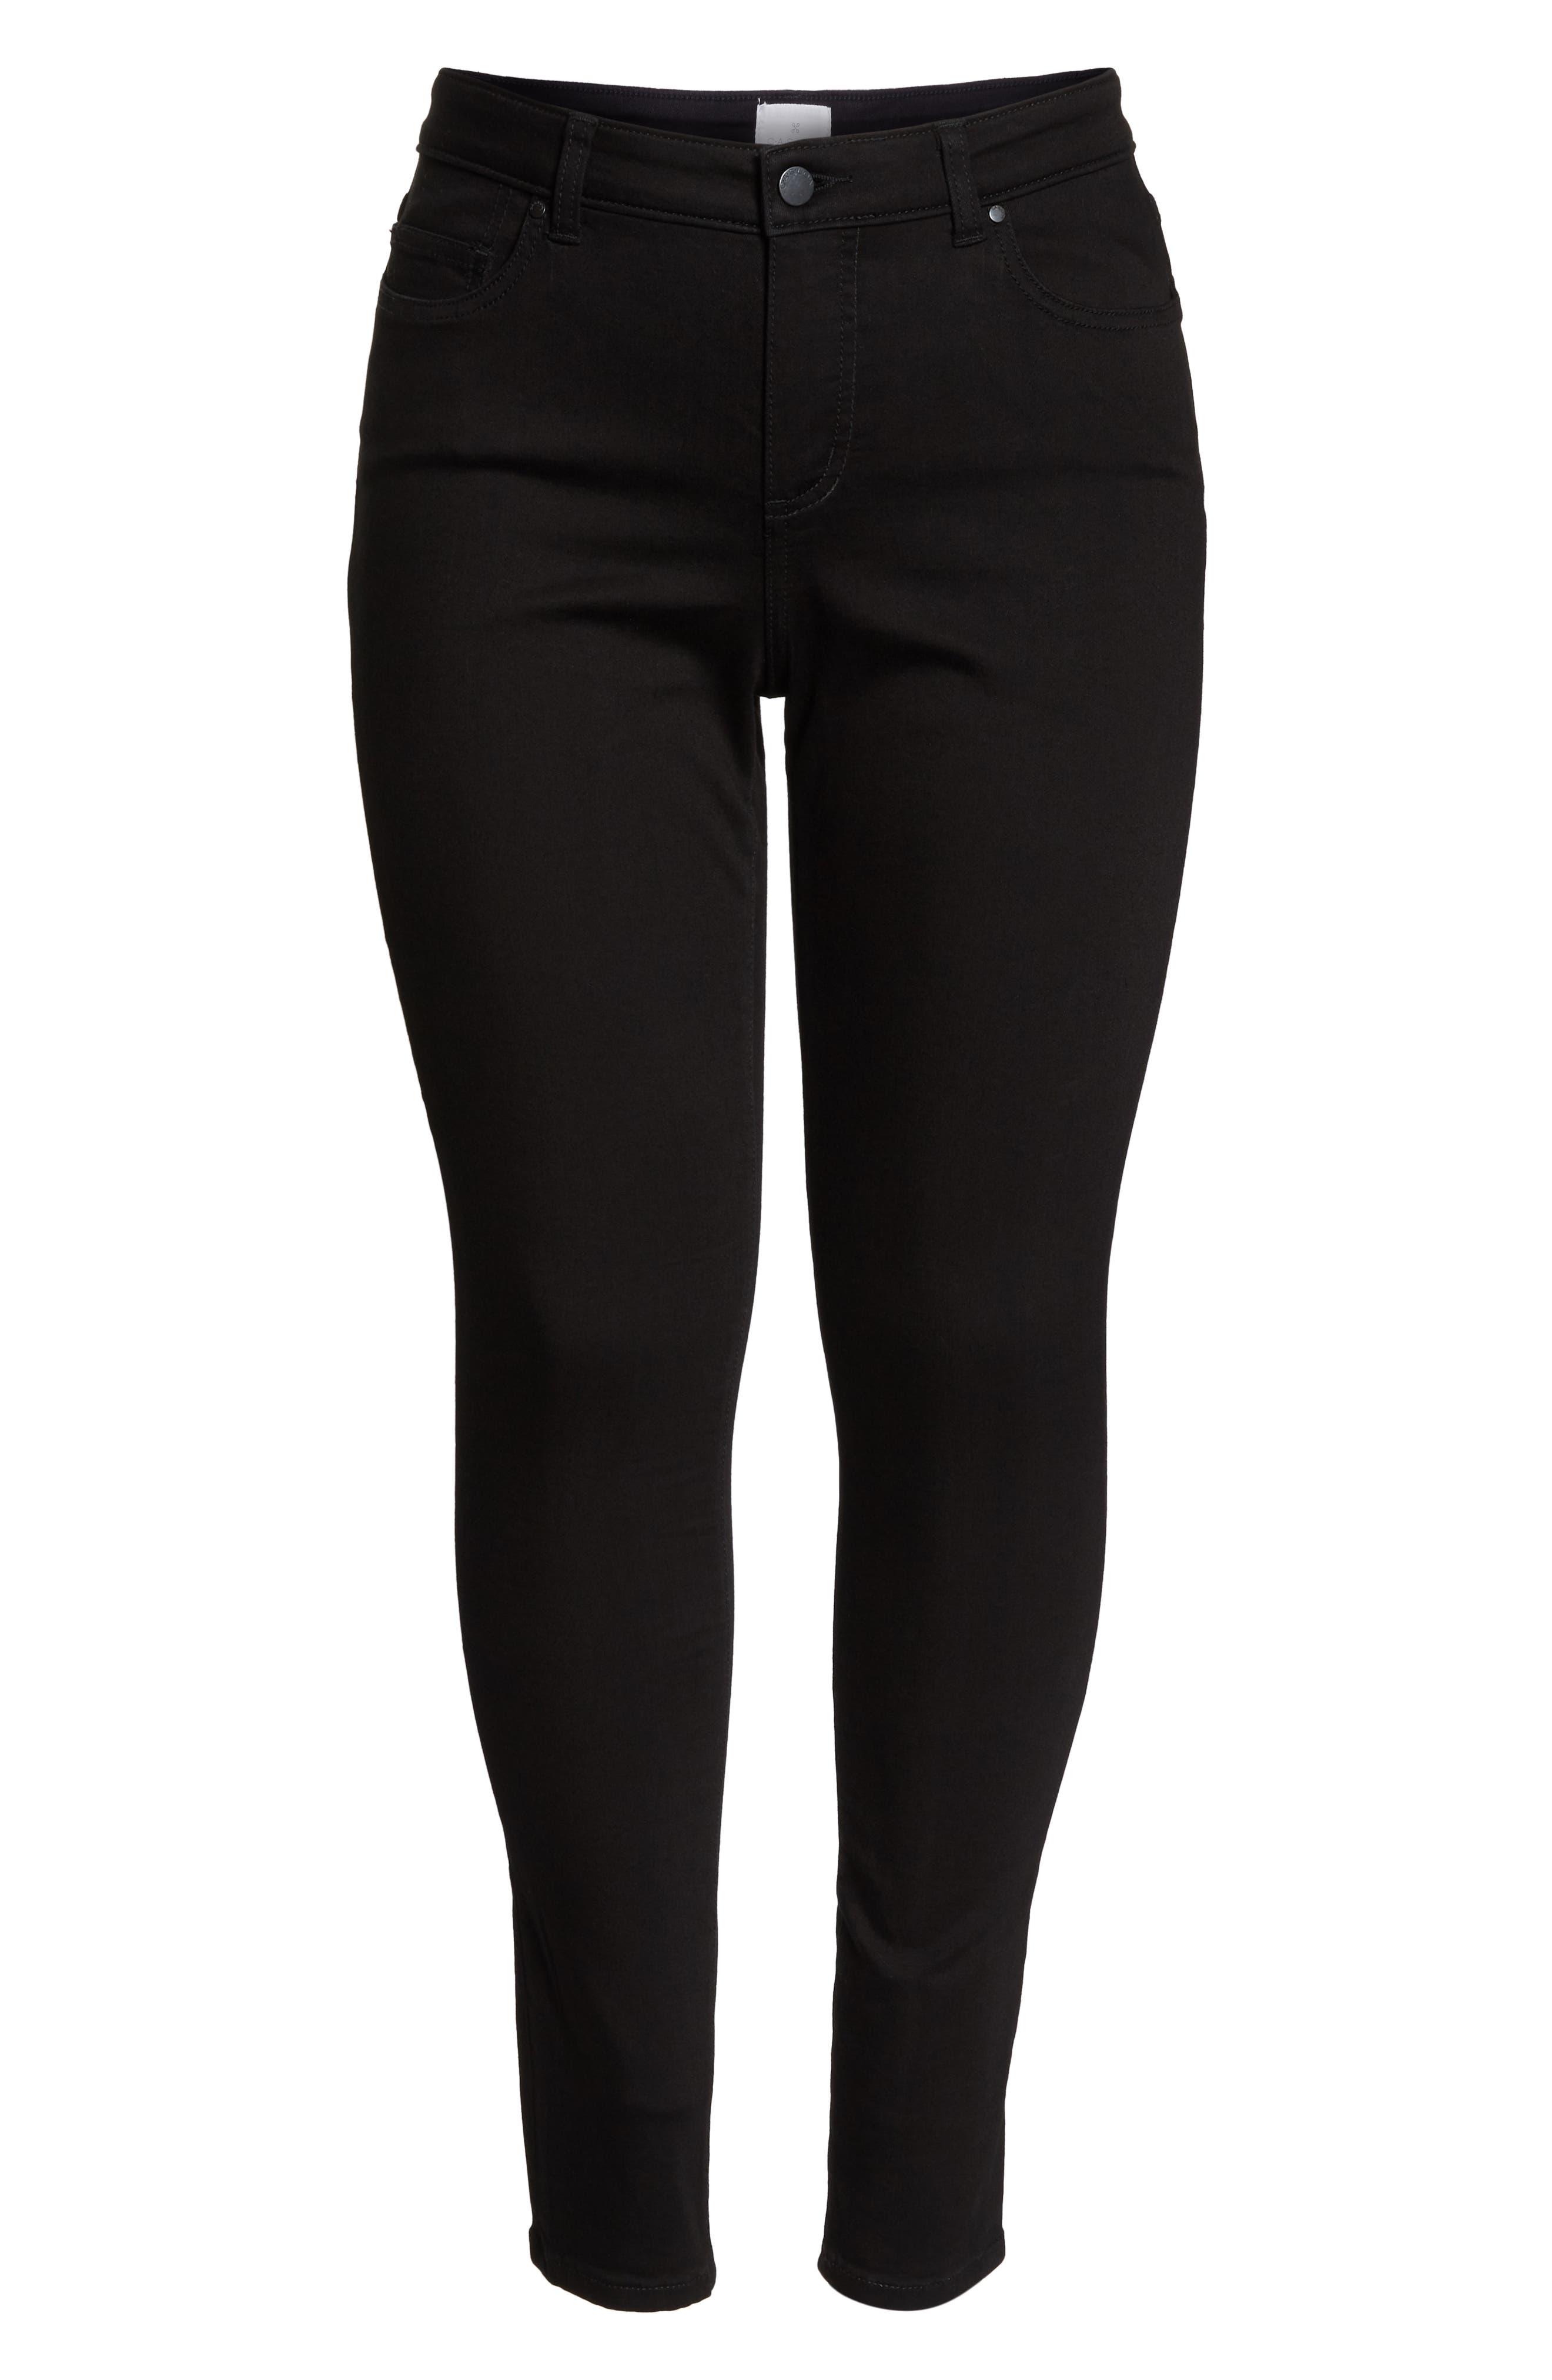 Stretch Skinny Jeans,                             Alternate thumbnail 7, color,                             BLACK WASH